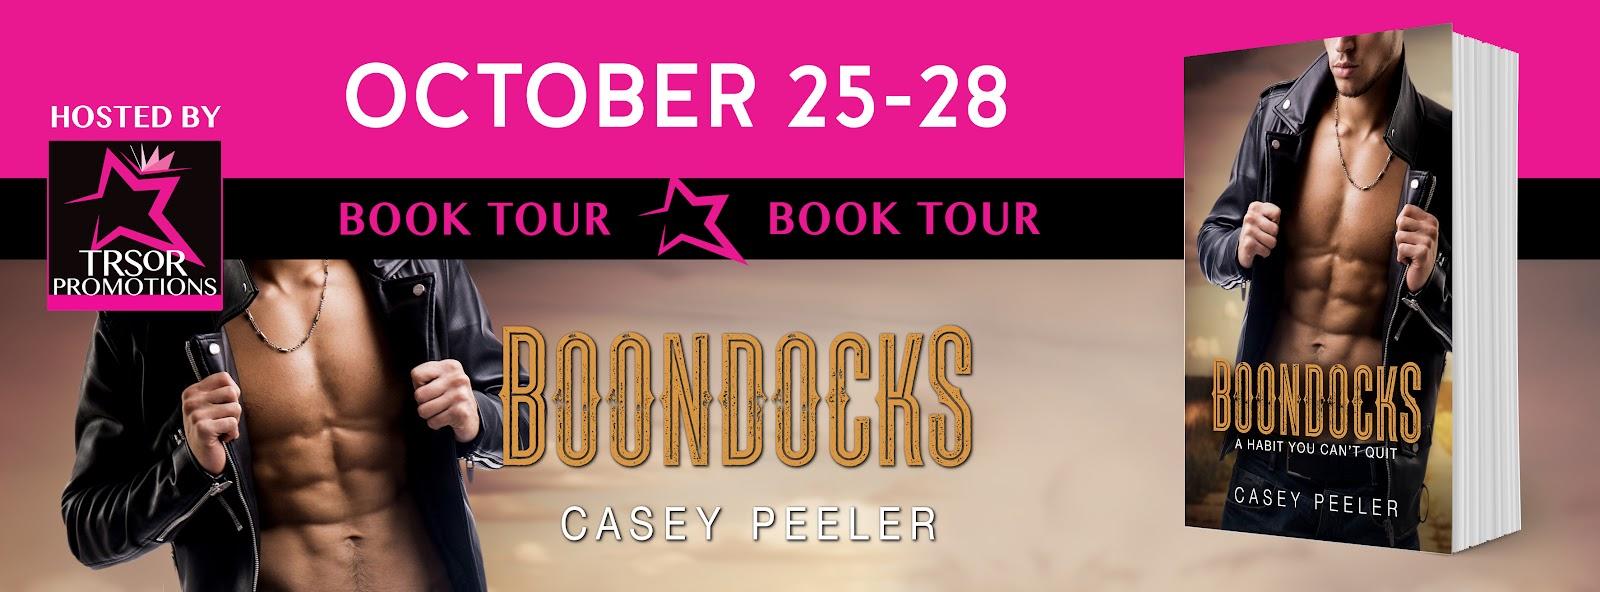 BOONDOCKS_BOOK_TOUR.jpg